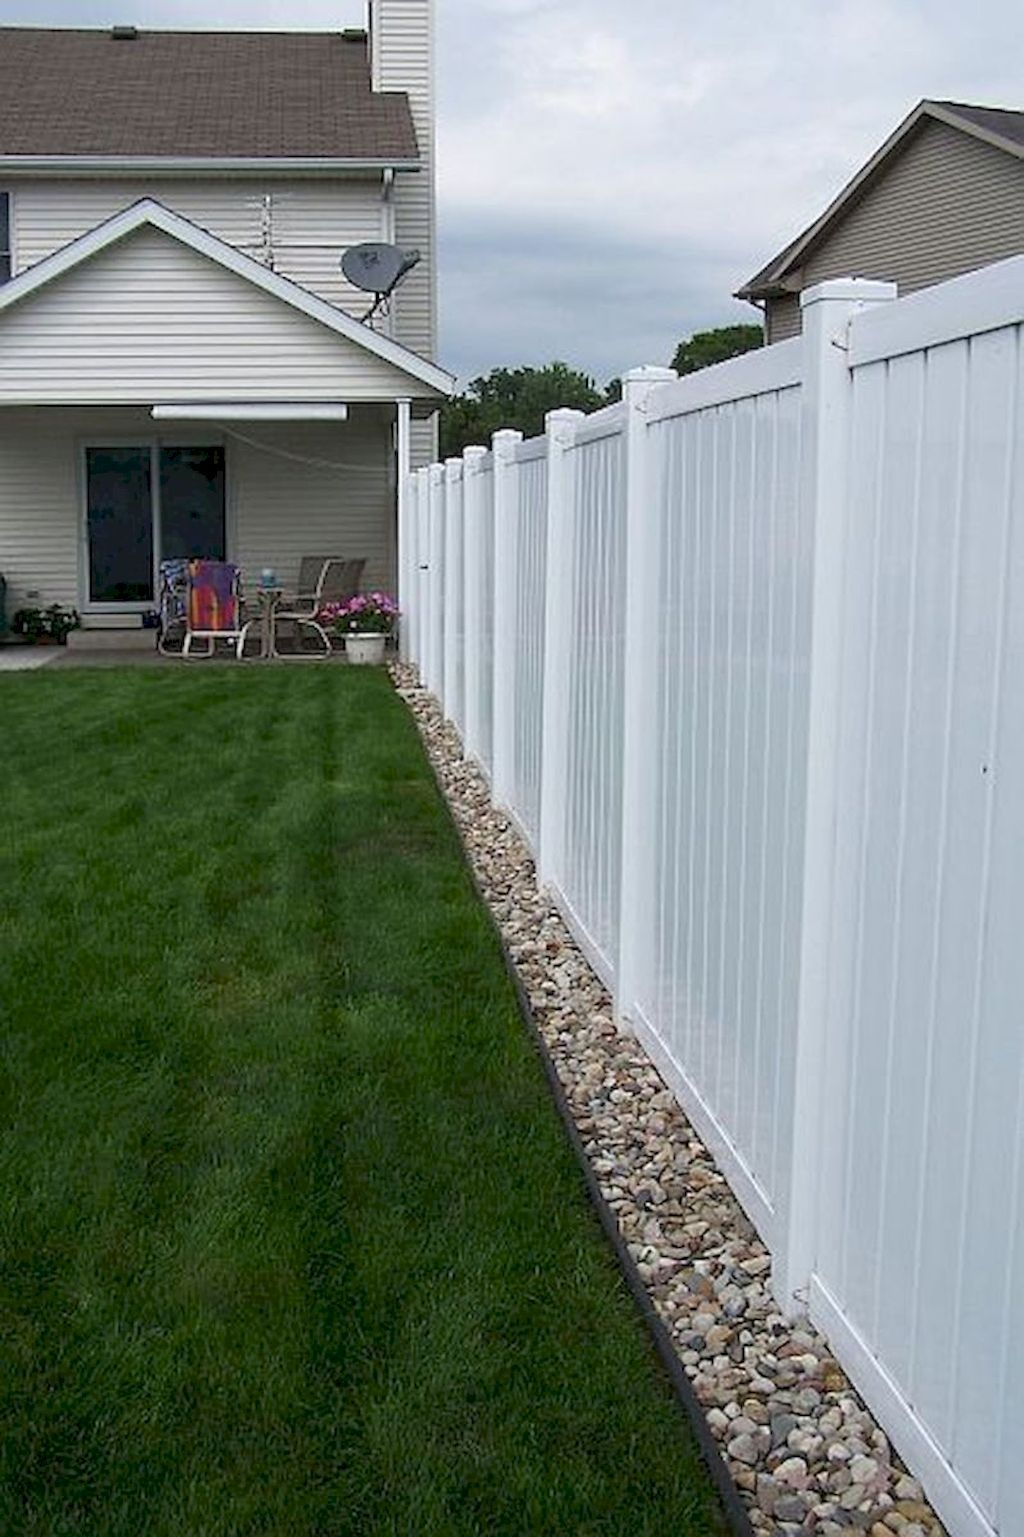 03 easy and cheap privacy fence design ideas backyard on backyard garden fence decor ideas id=19432